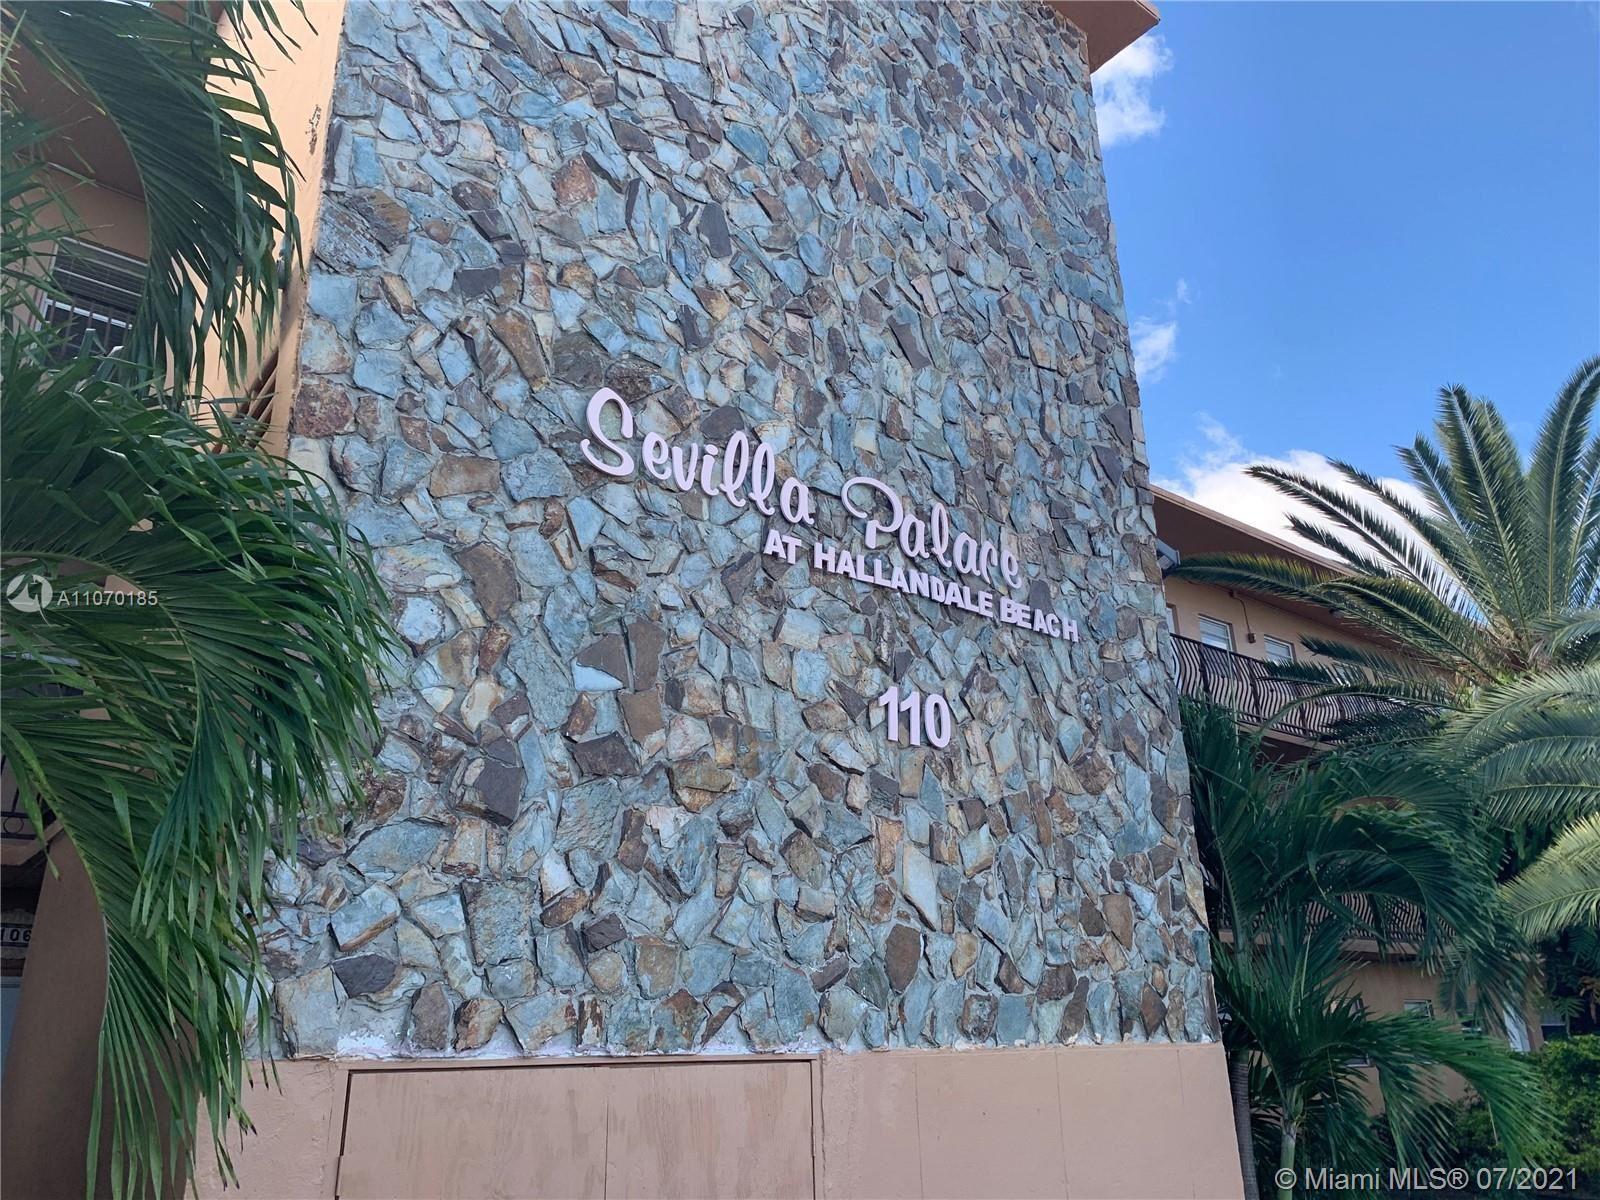 110 SE 2nd St #203, Hallandale Beach, FL 33009 - #: A11070185